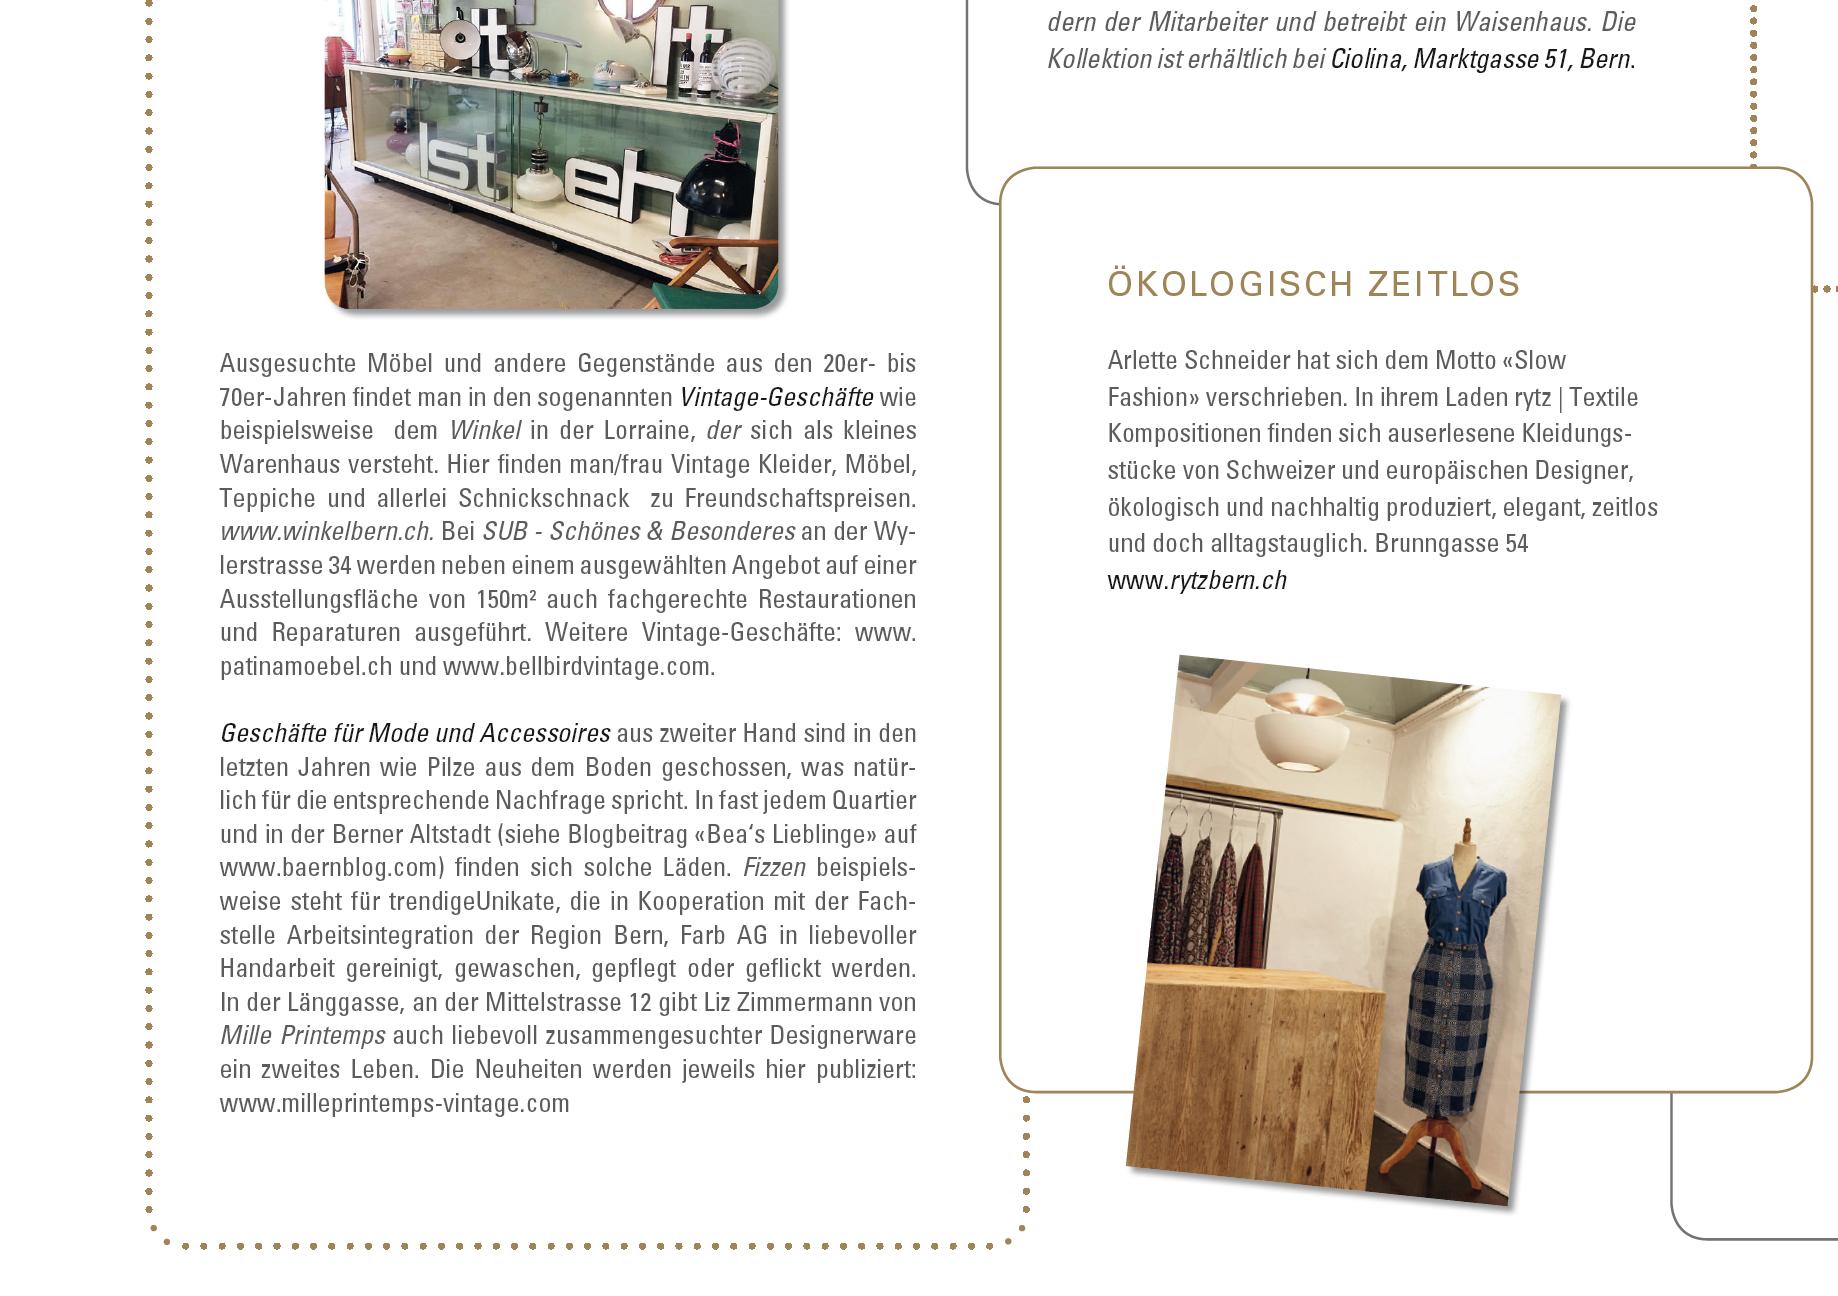 rytz-bern-magazin-detail.png